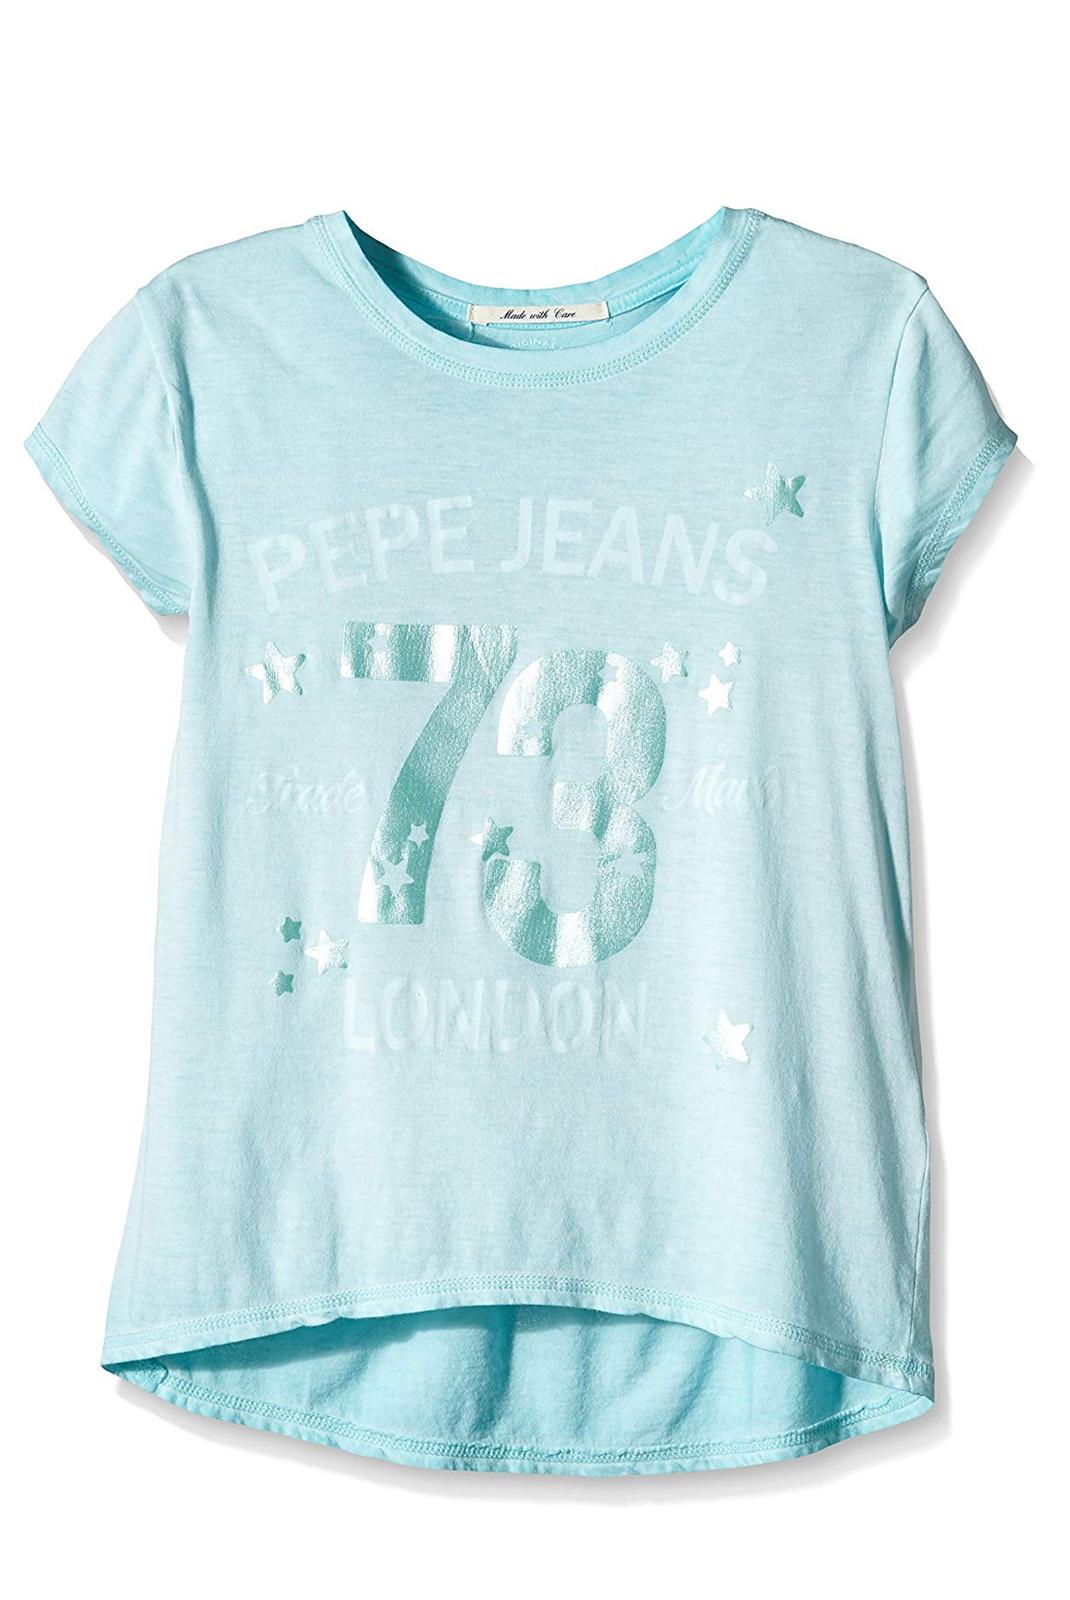 Hauts  Pepe jeans PG500809 hilary 517